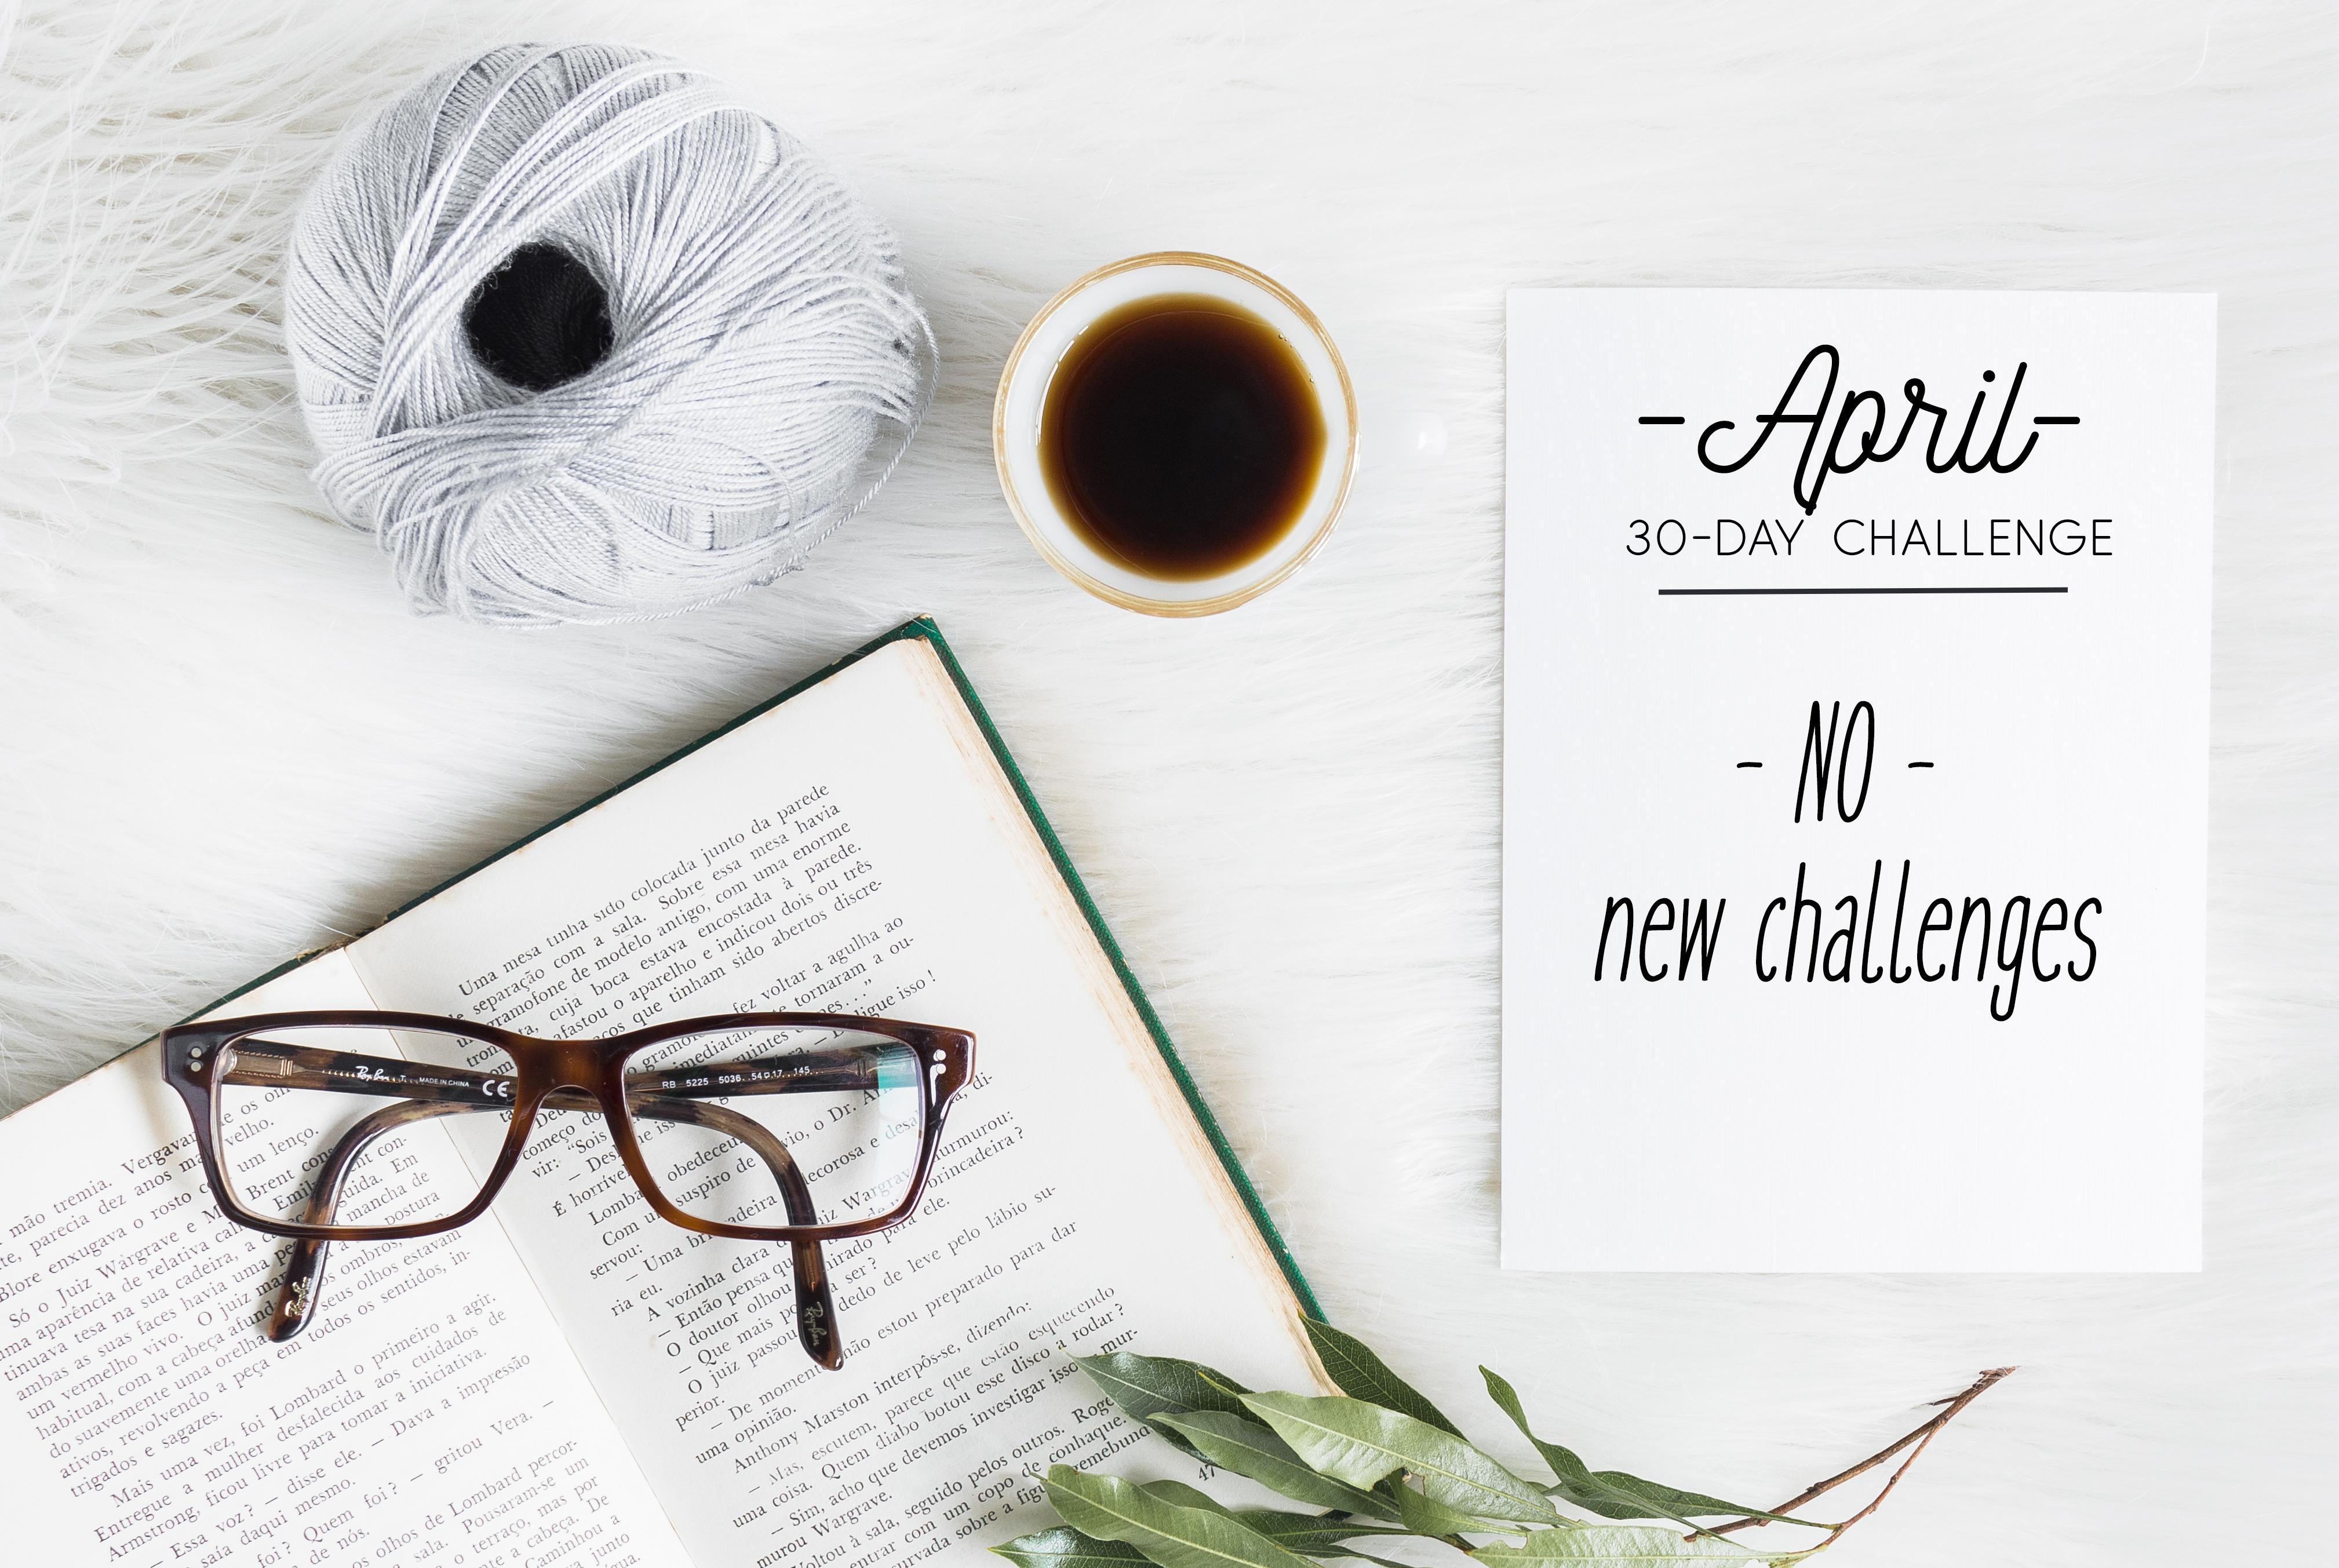 30-day_Challenge_april.jpg